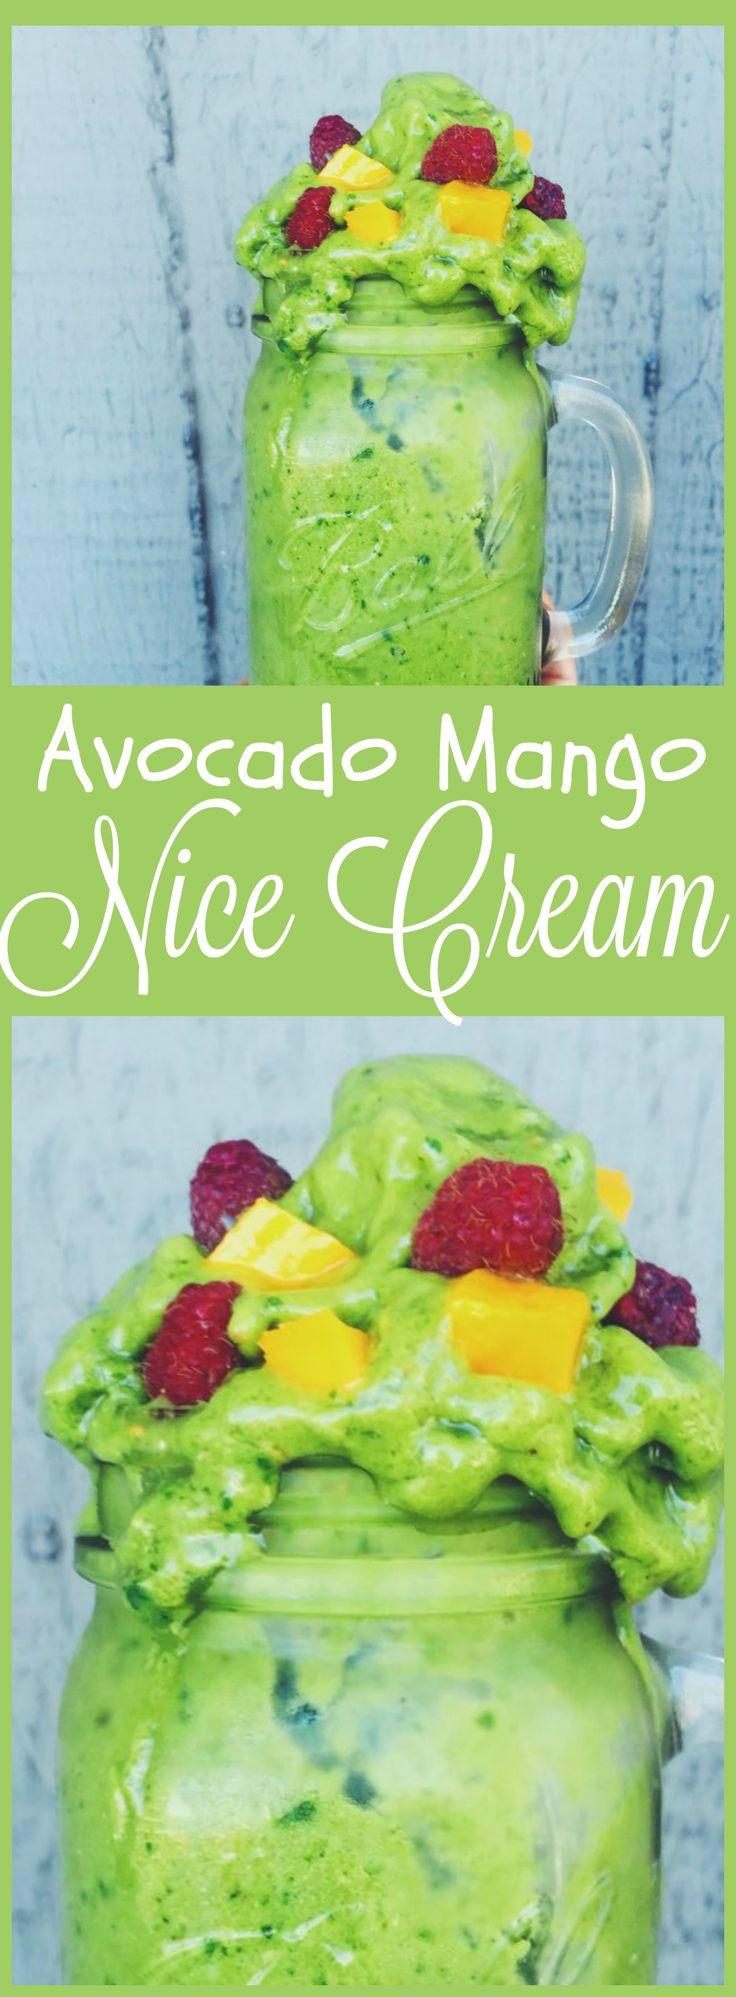 http://www.furtherfood.com/recipe/avocado-mango-collagen-nice-cream/